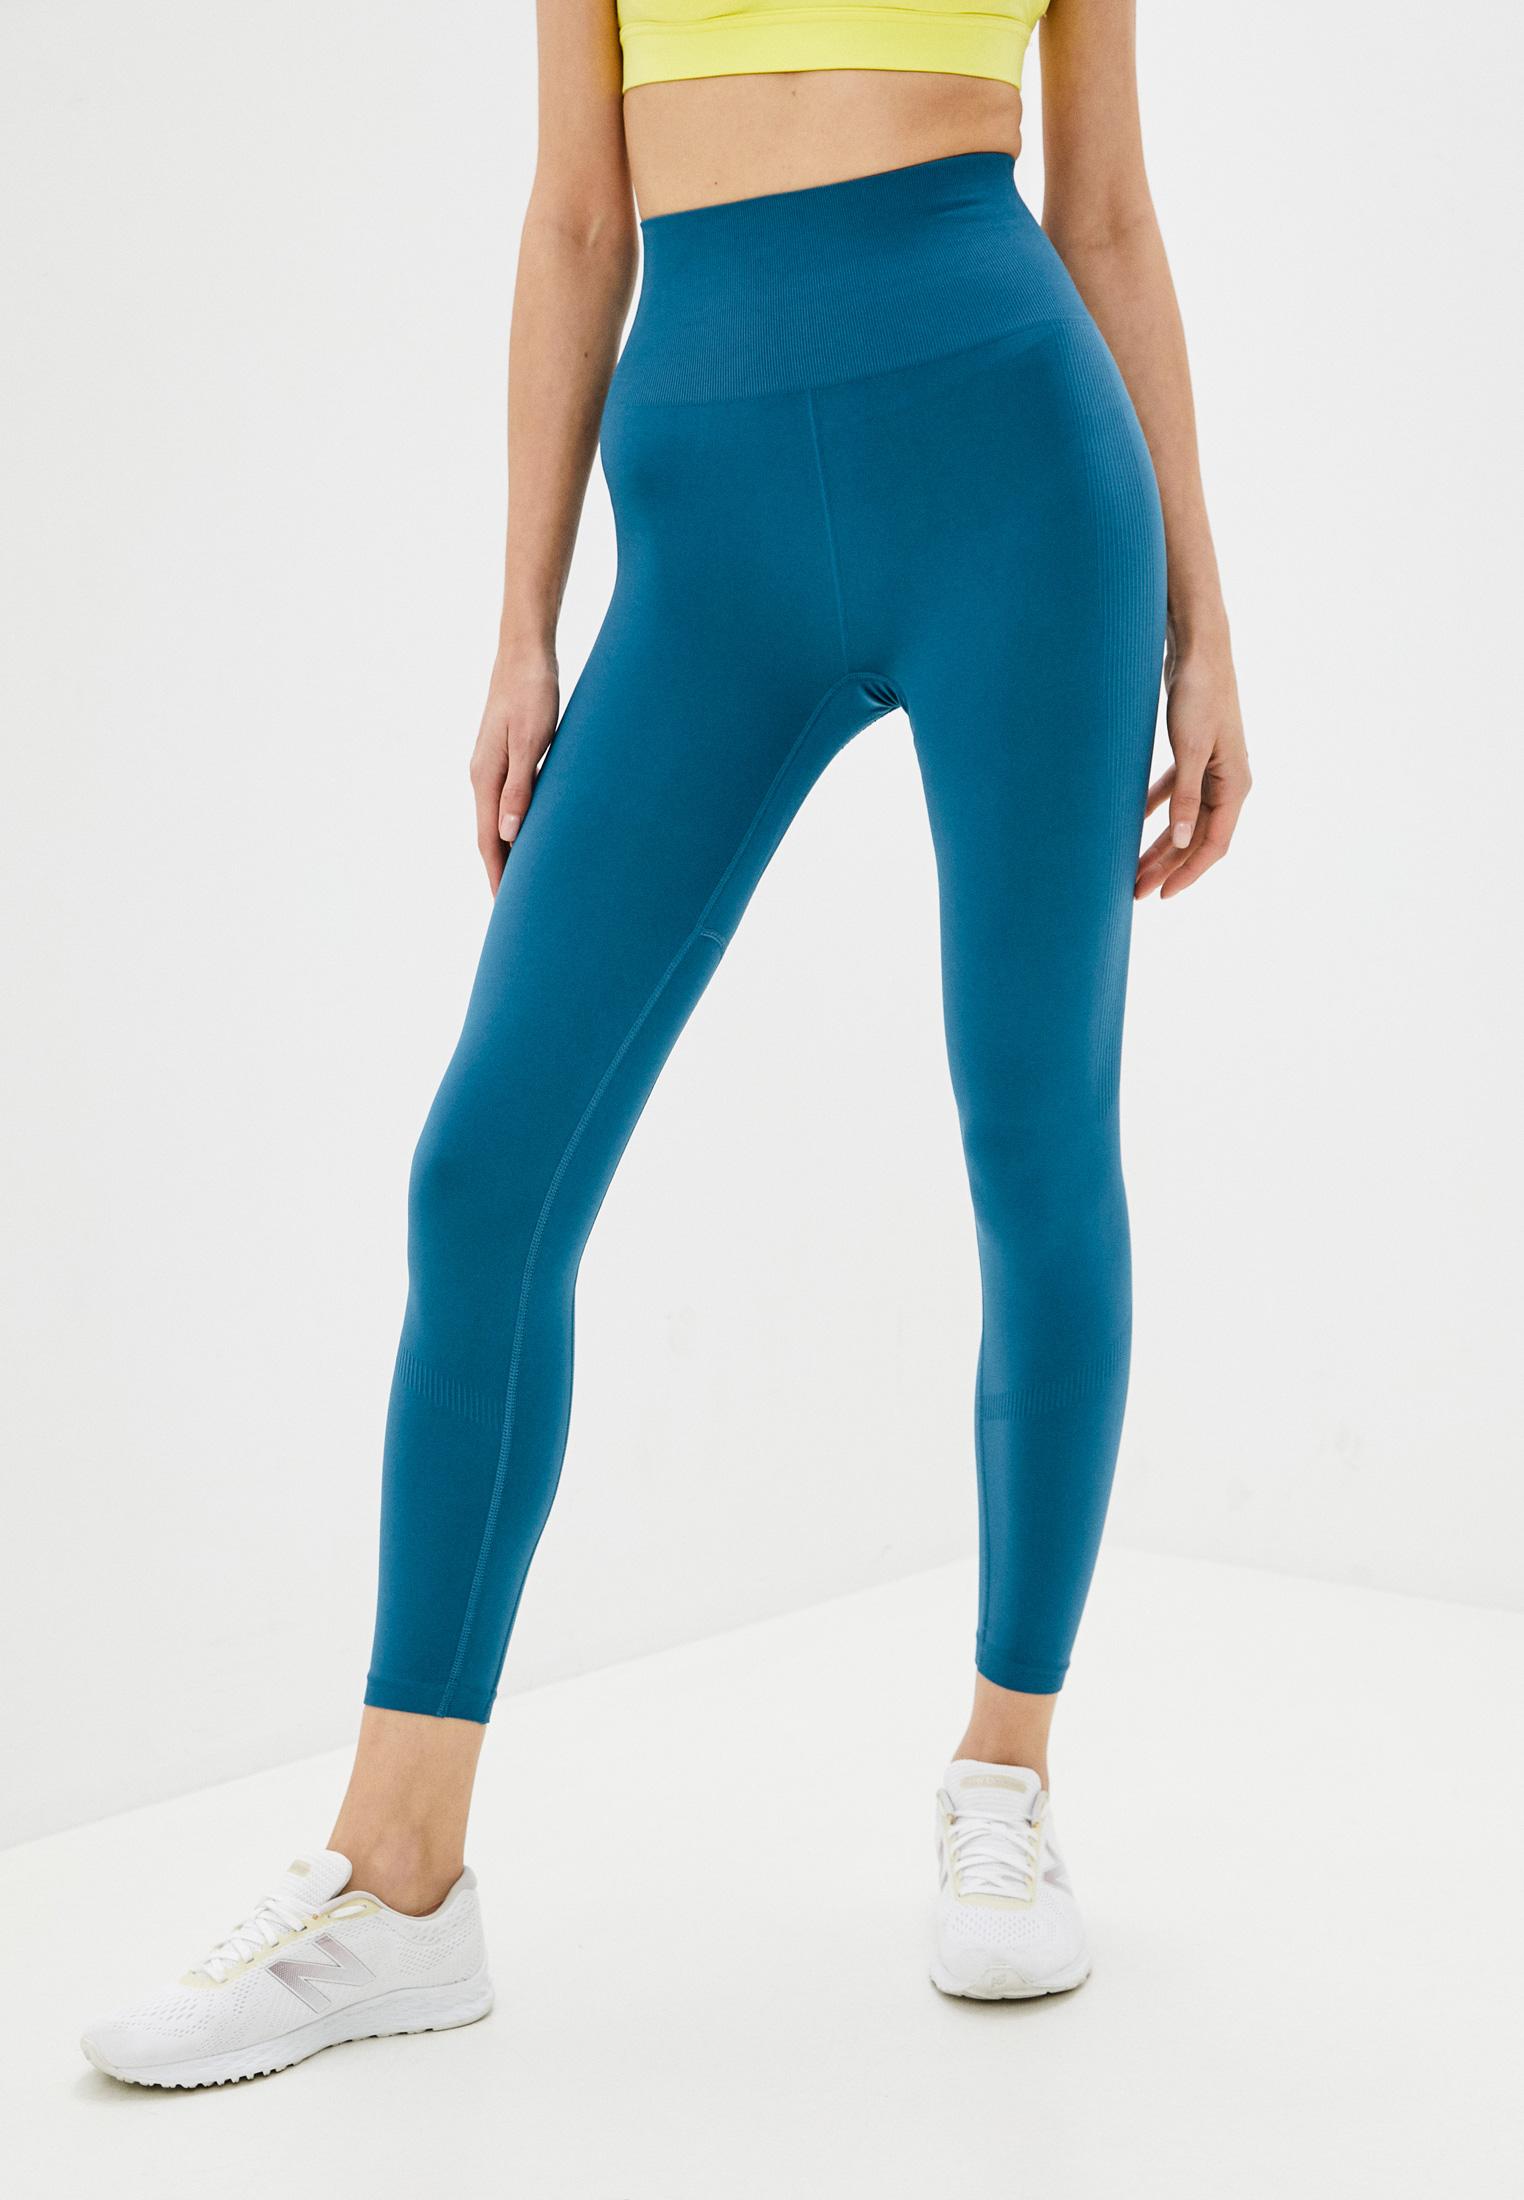 Женские брюки The North Face (Зе Норт Фейс) TA4AT4Q31